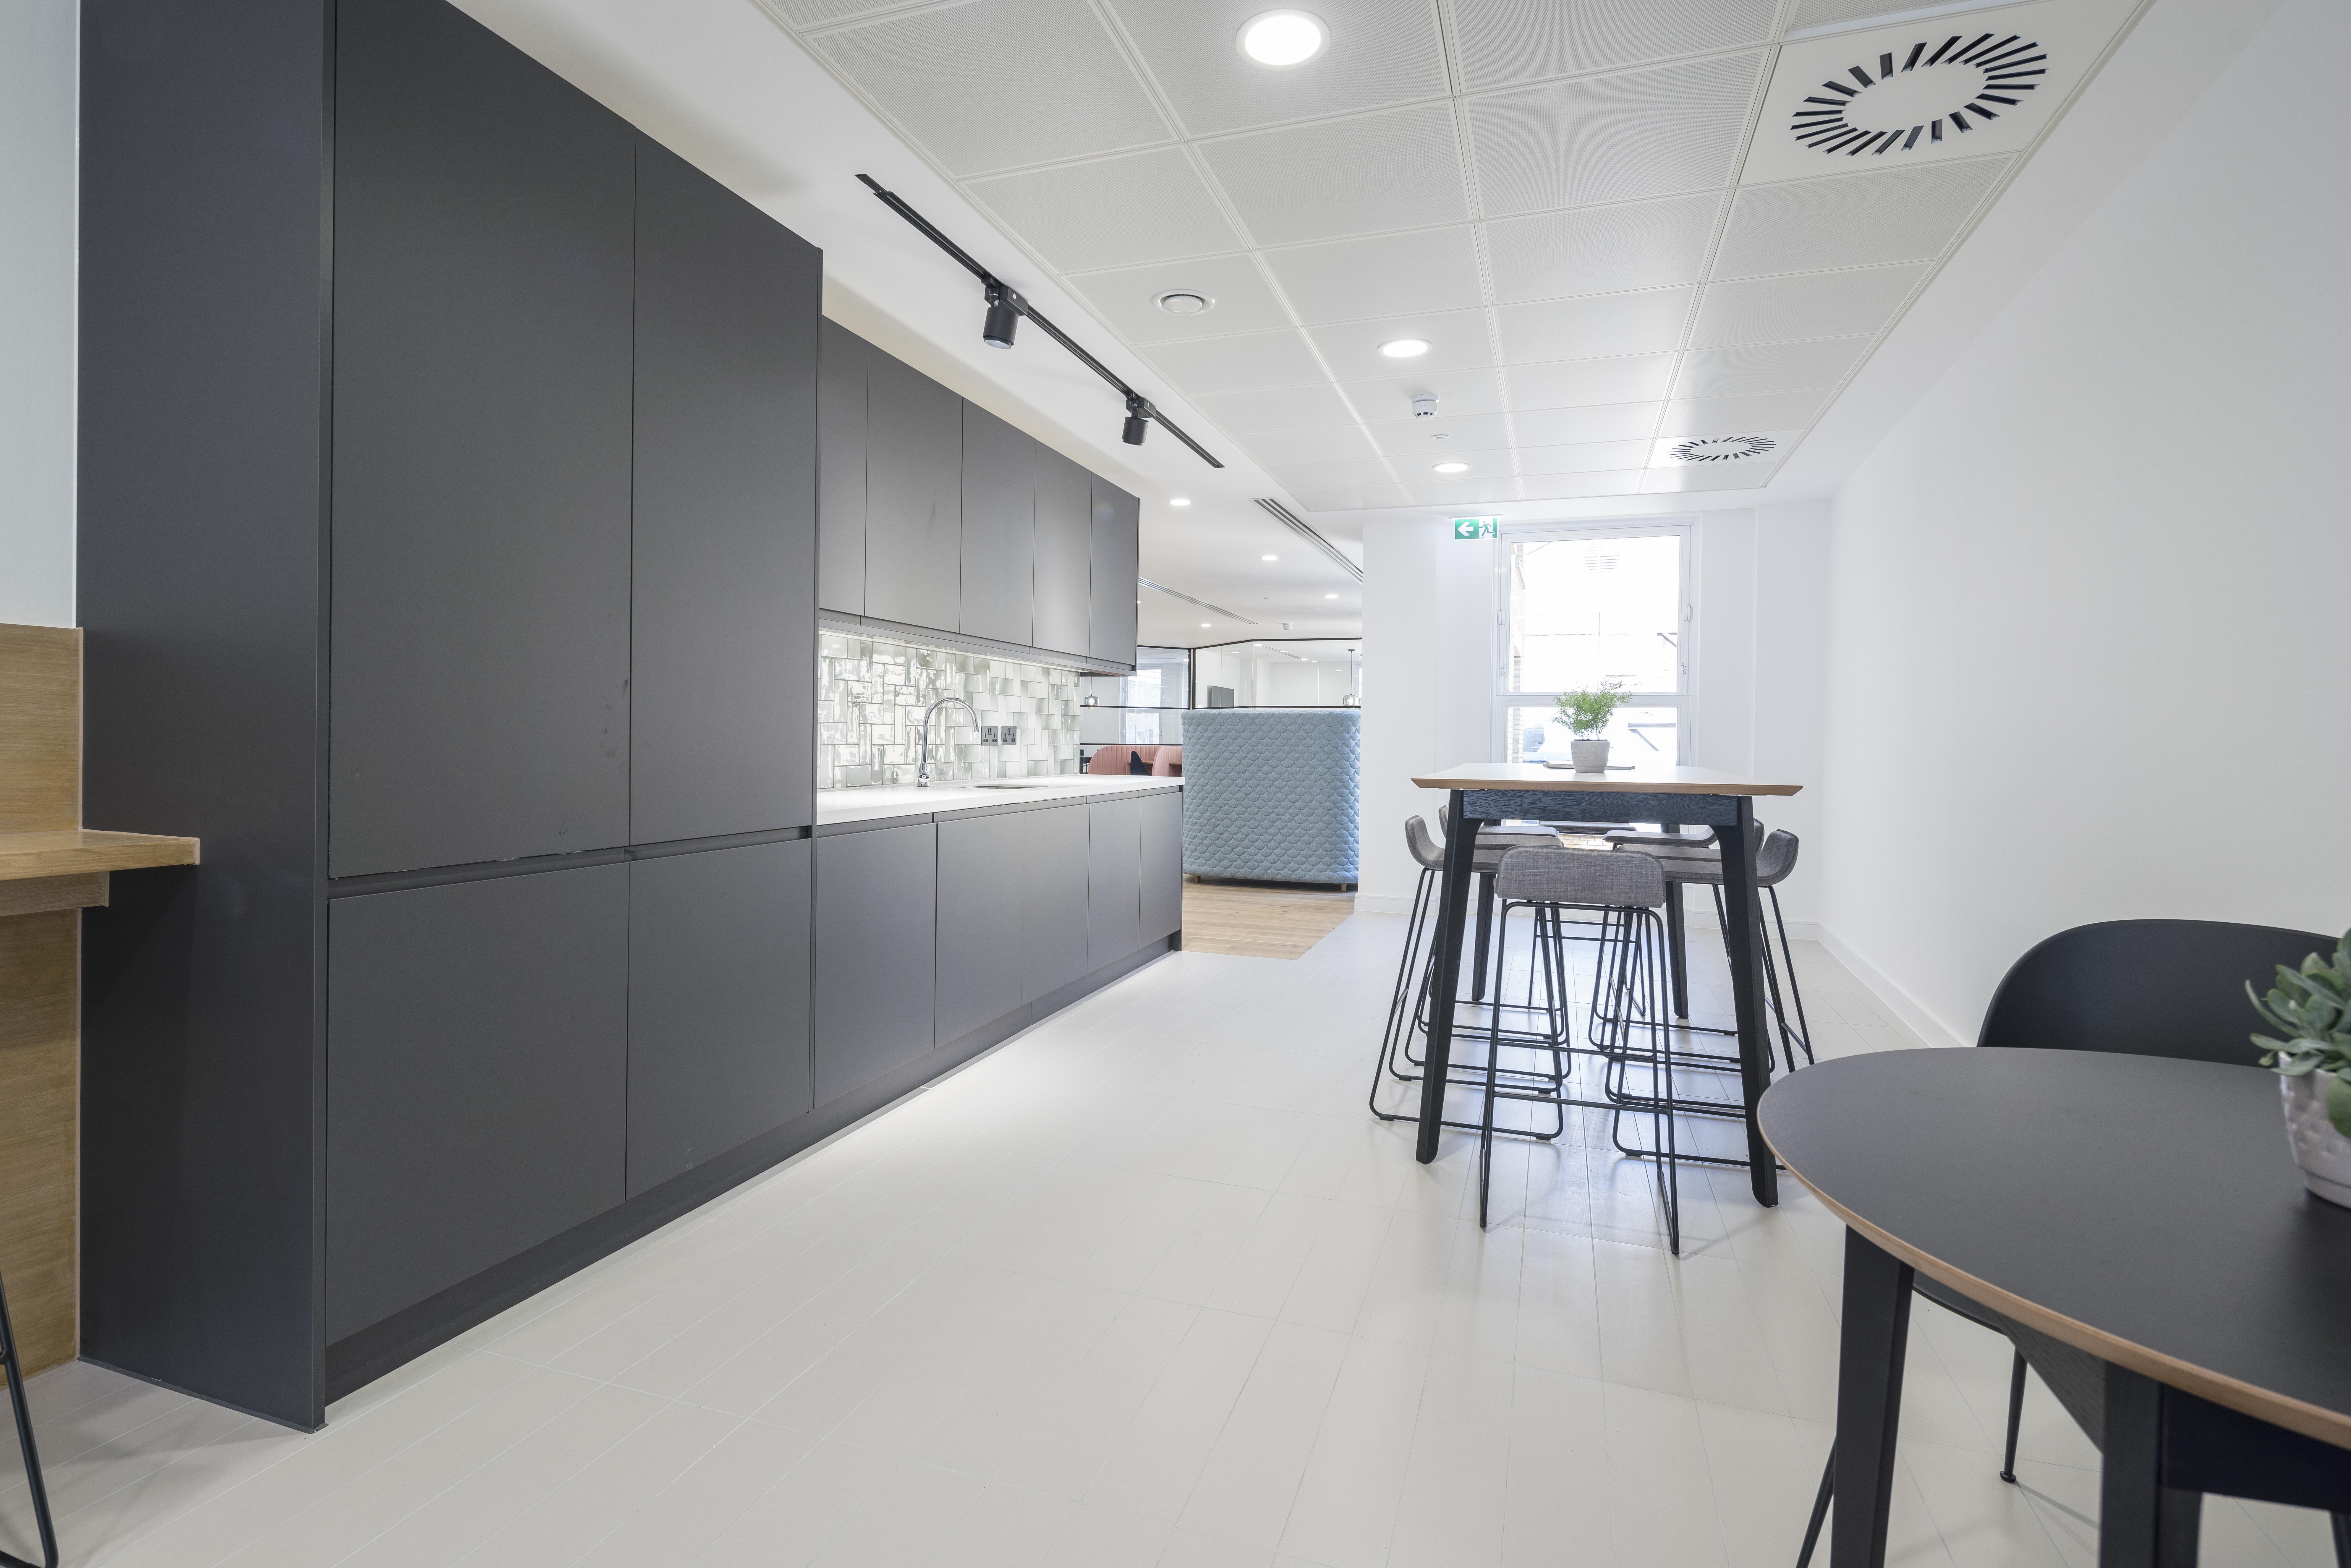 Office London, EC4N 8AD - 18 St. Swithin's Lane